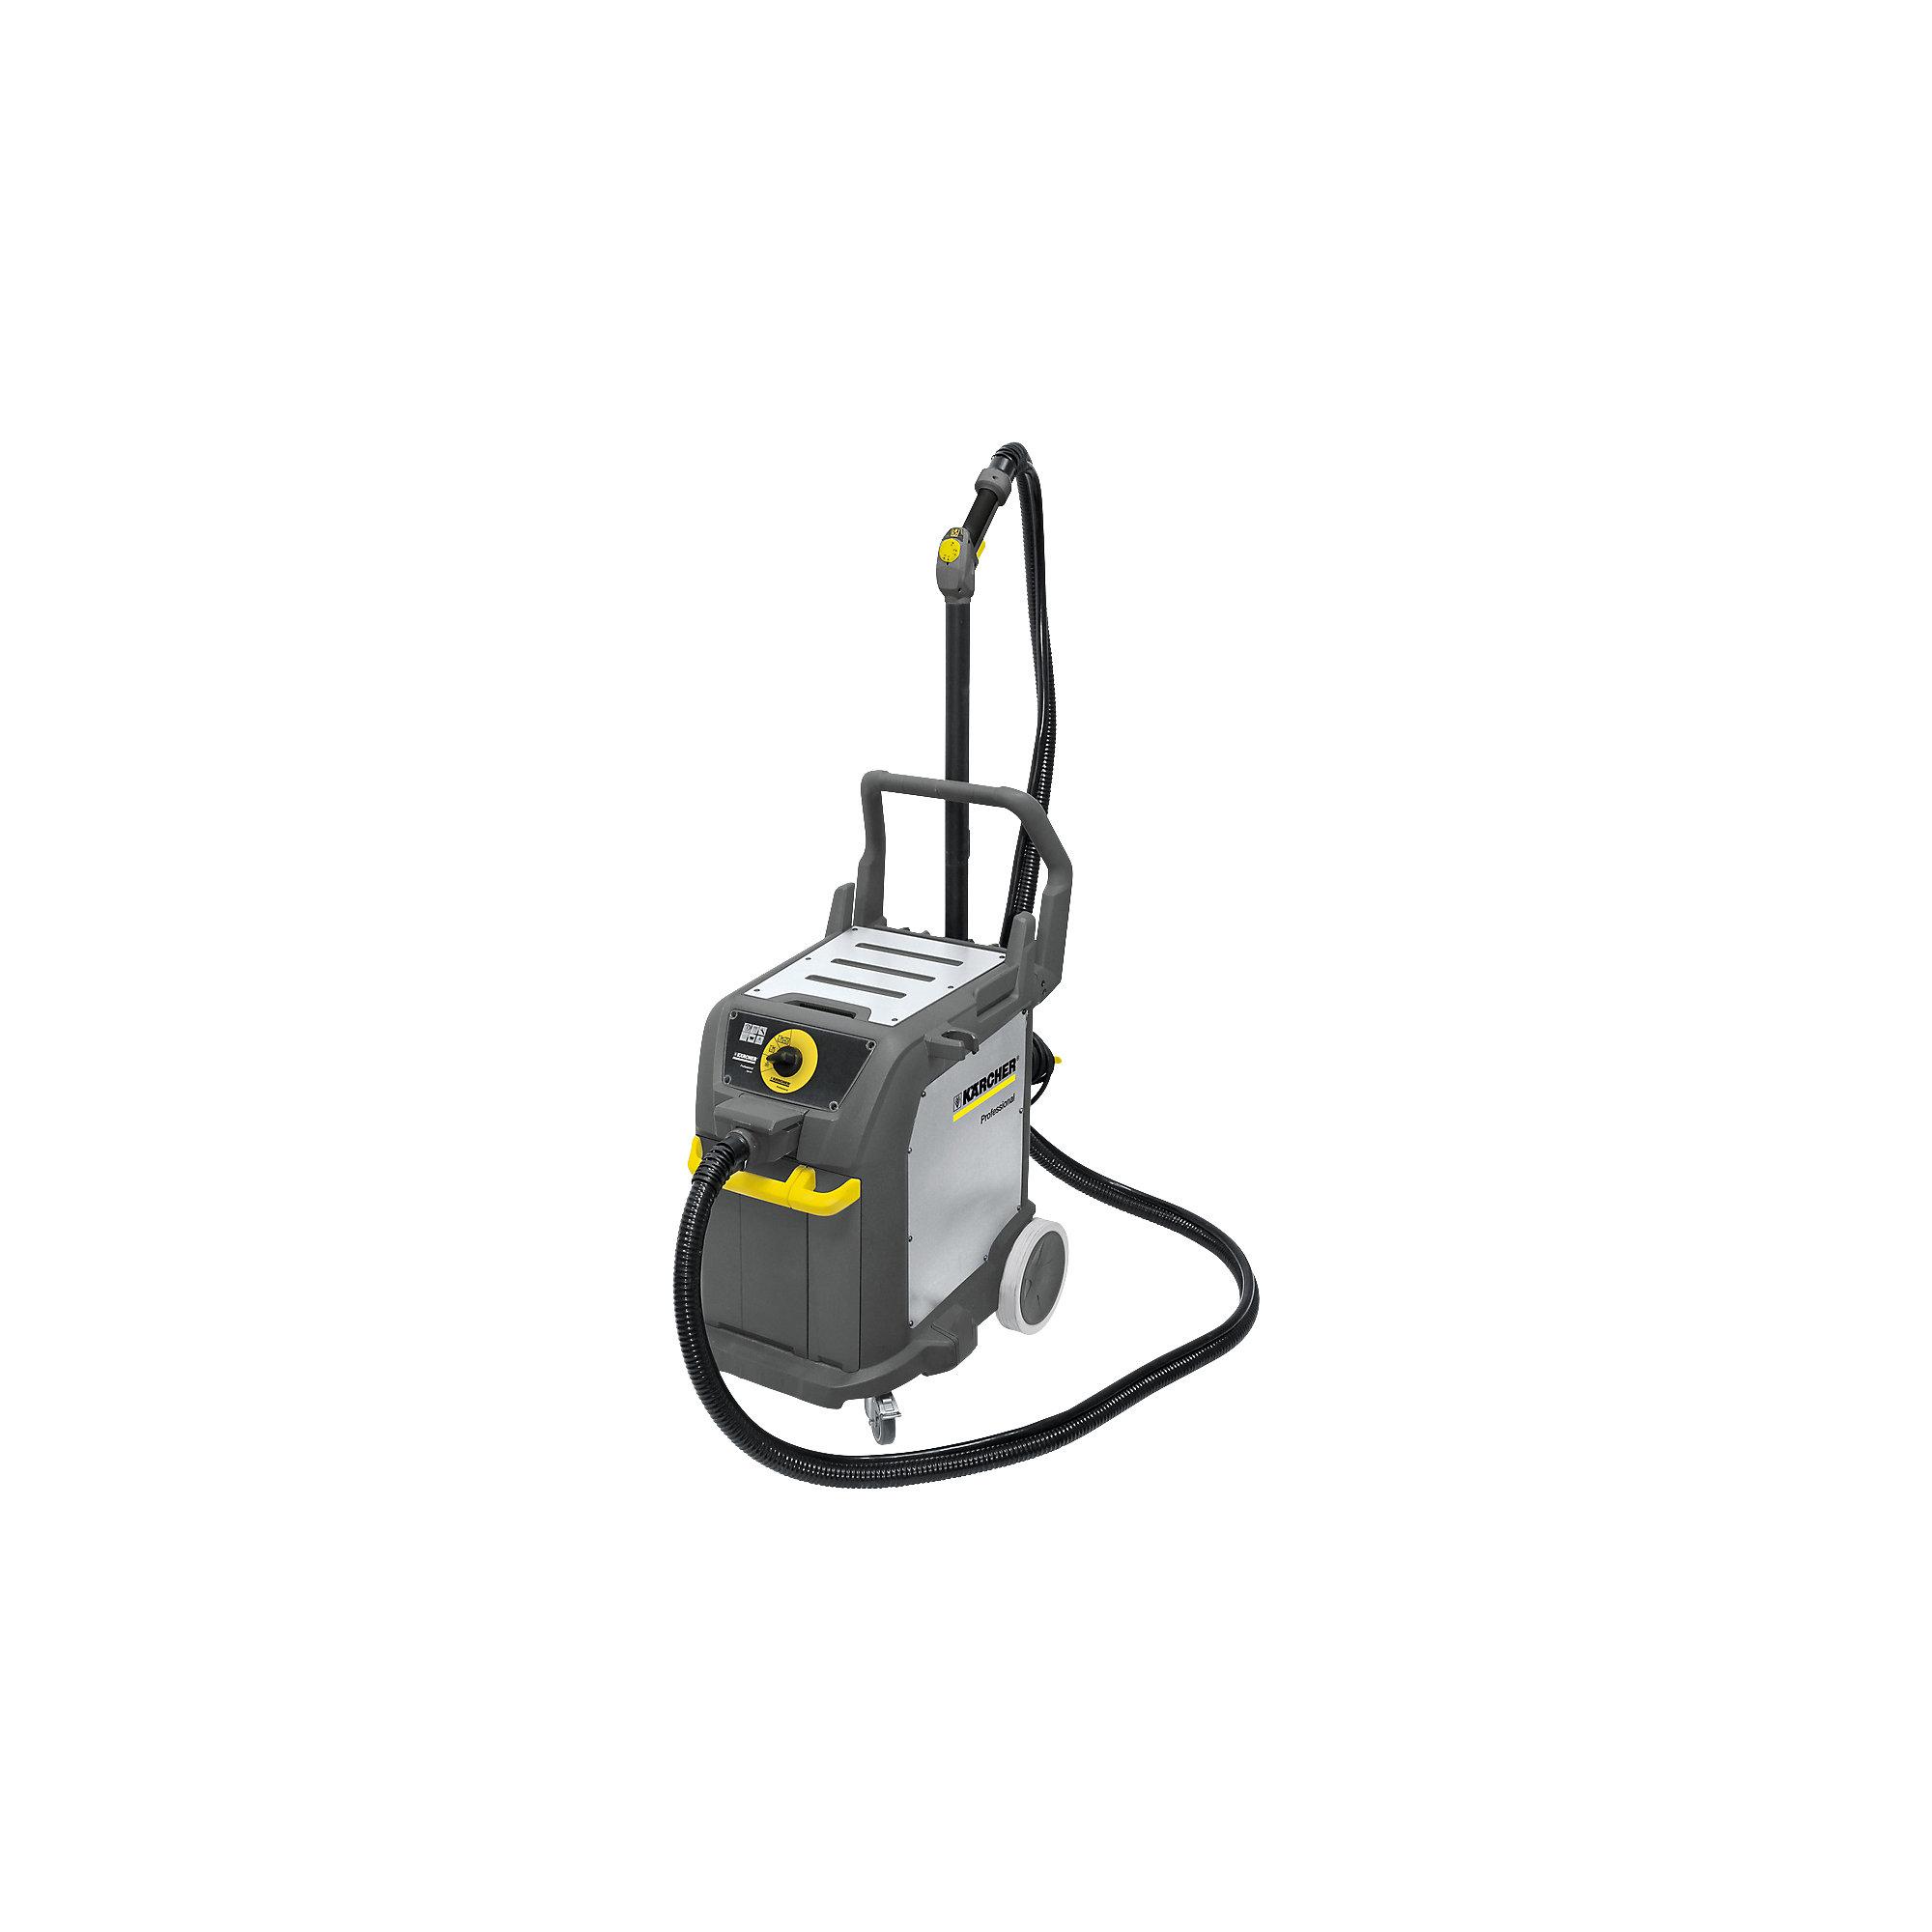 Karcher SGV 6/5 GB Steam Vacuum Cleaner